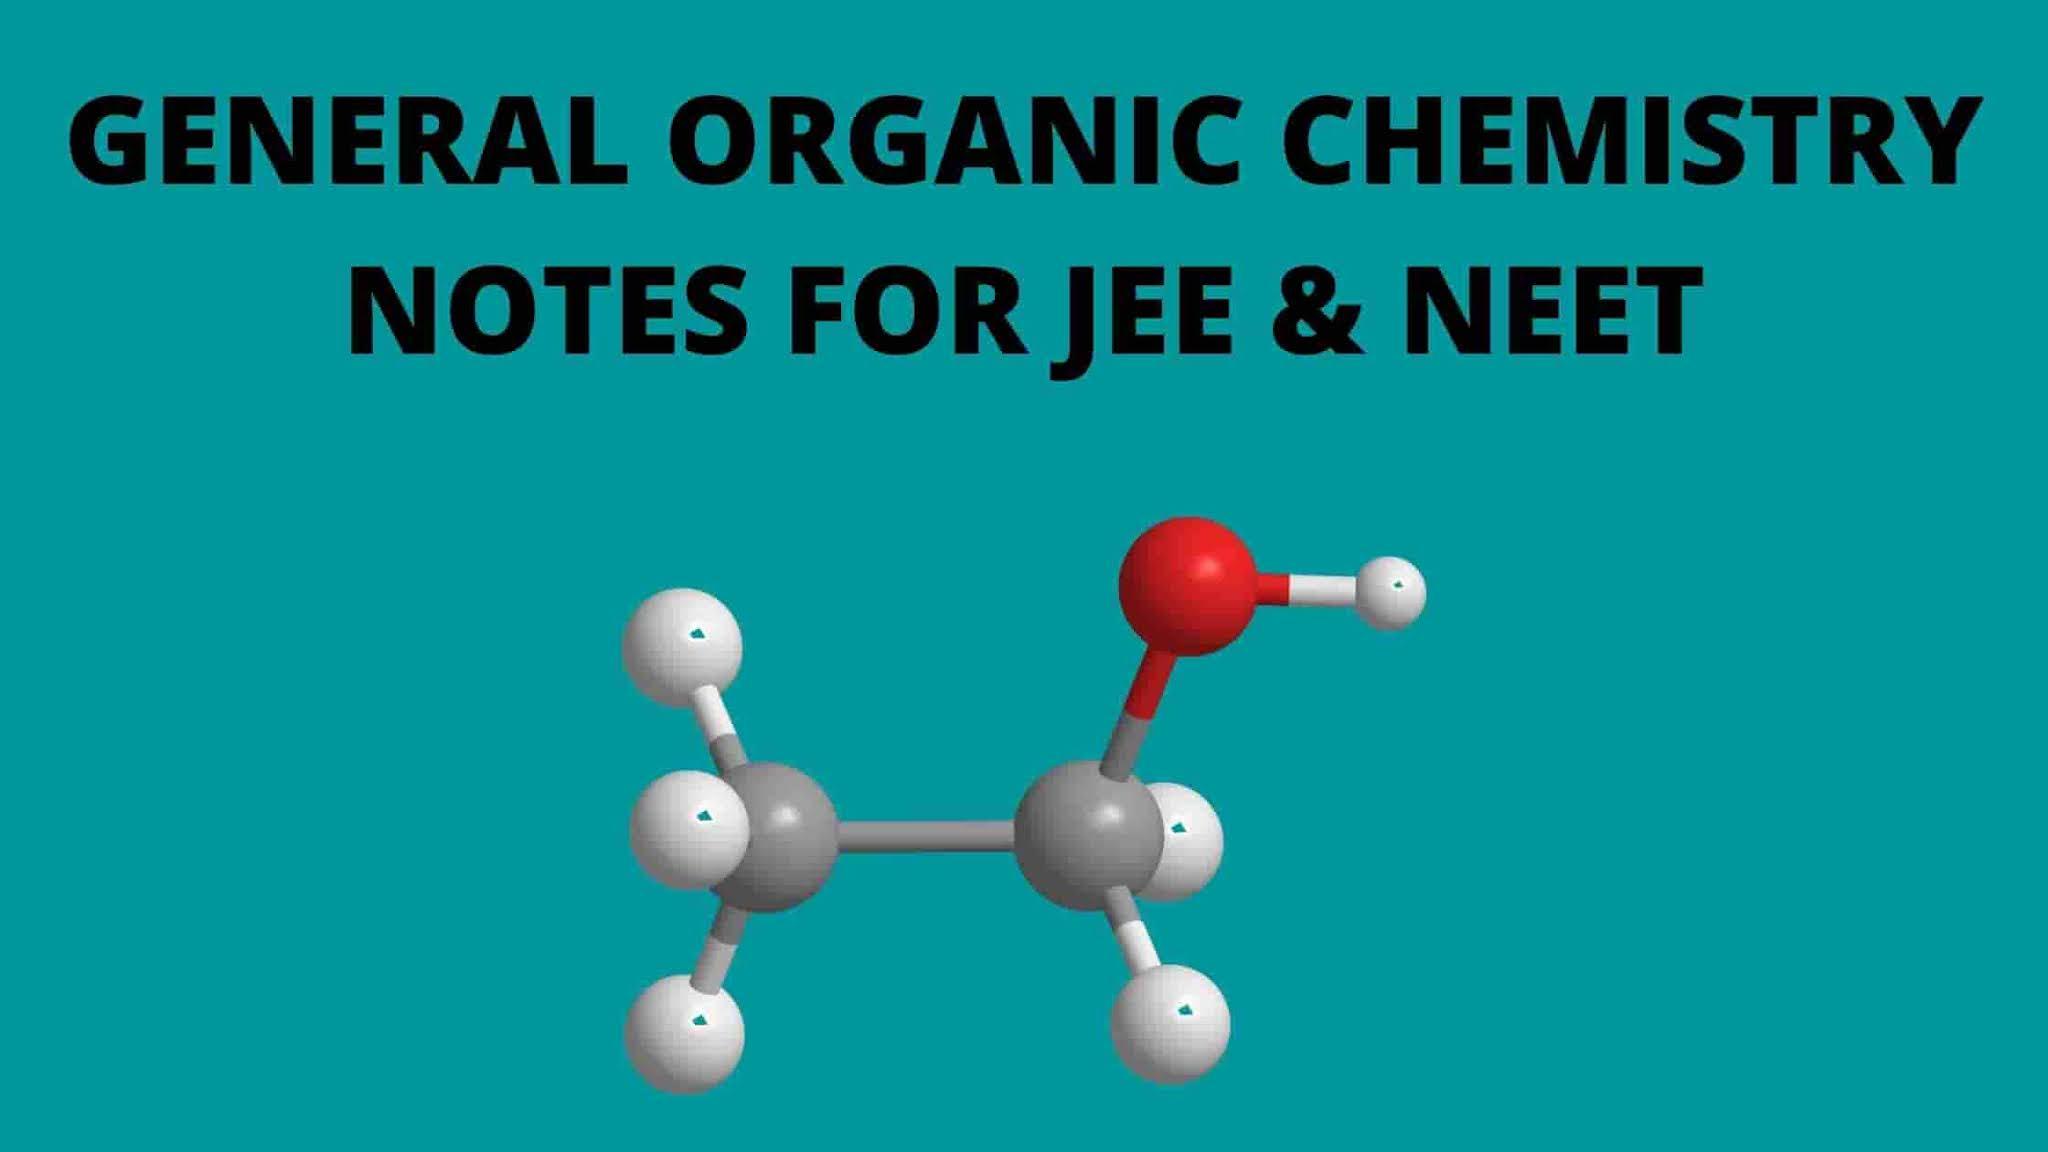 [PDF] General Organic Chemistry (GOC) Notes For IIT JEE & NEET